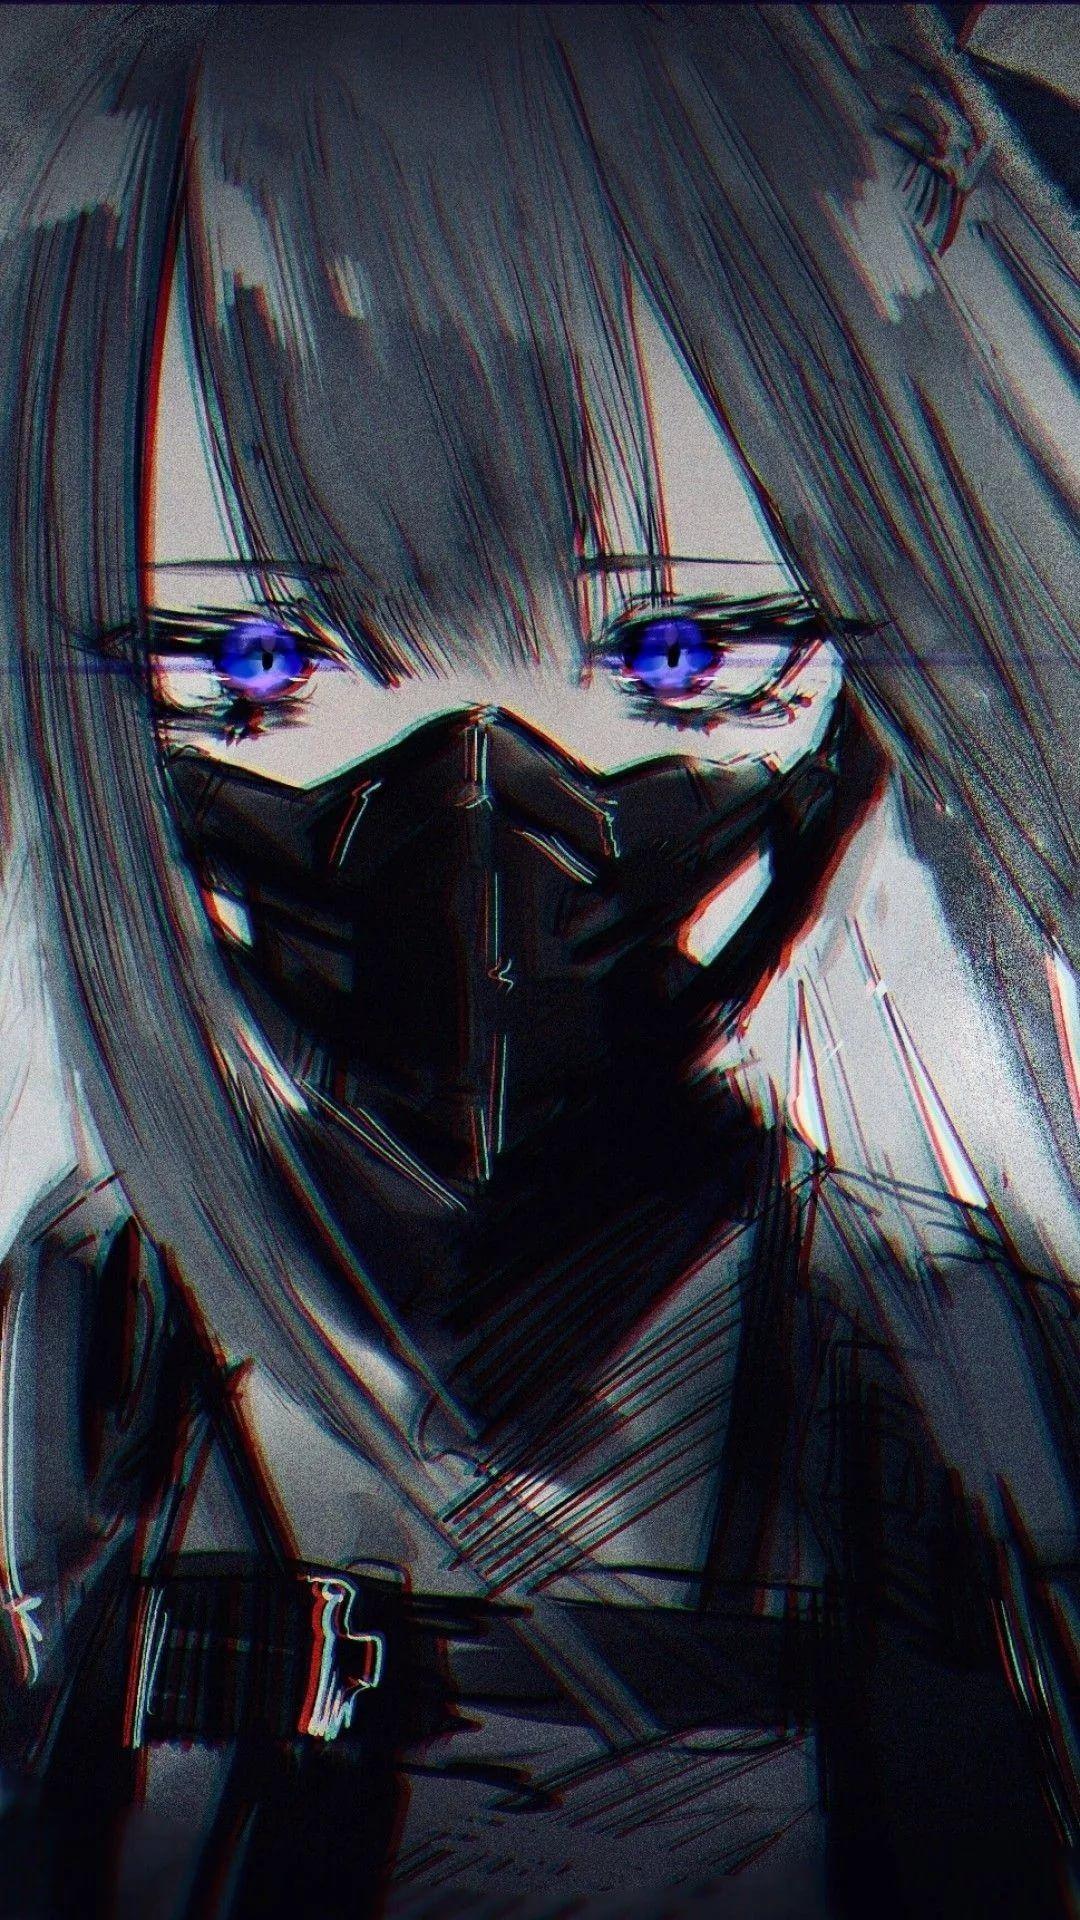 Sad Dark Supreme Anime Girl Wallpapers - Wallpaper Cave